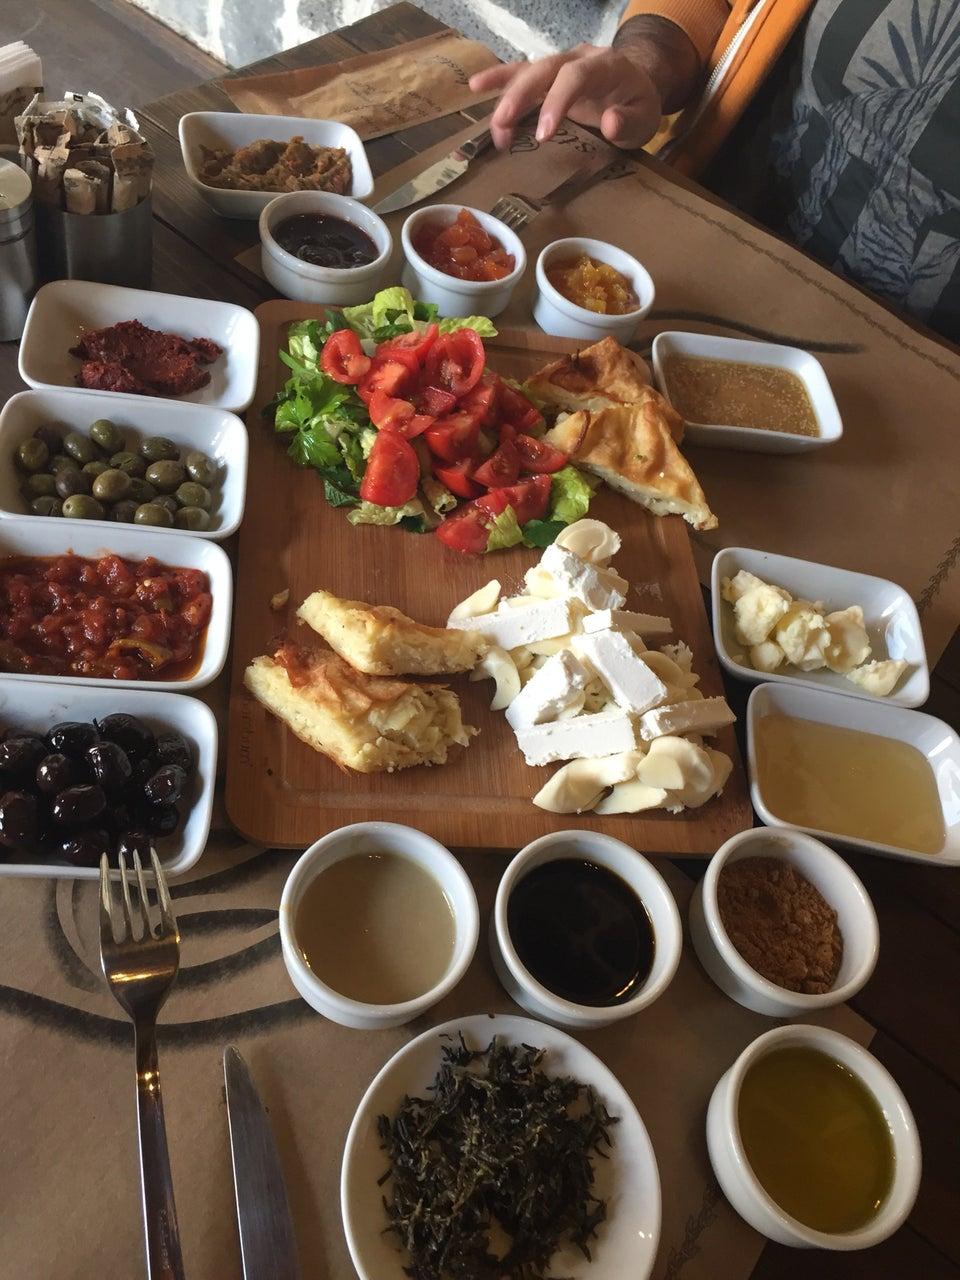 KASTAL CAFE & ŞÜKRÜ EFENDİ KONAĞI